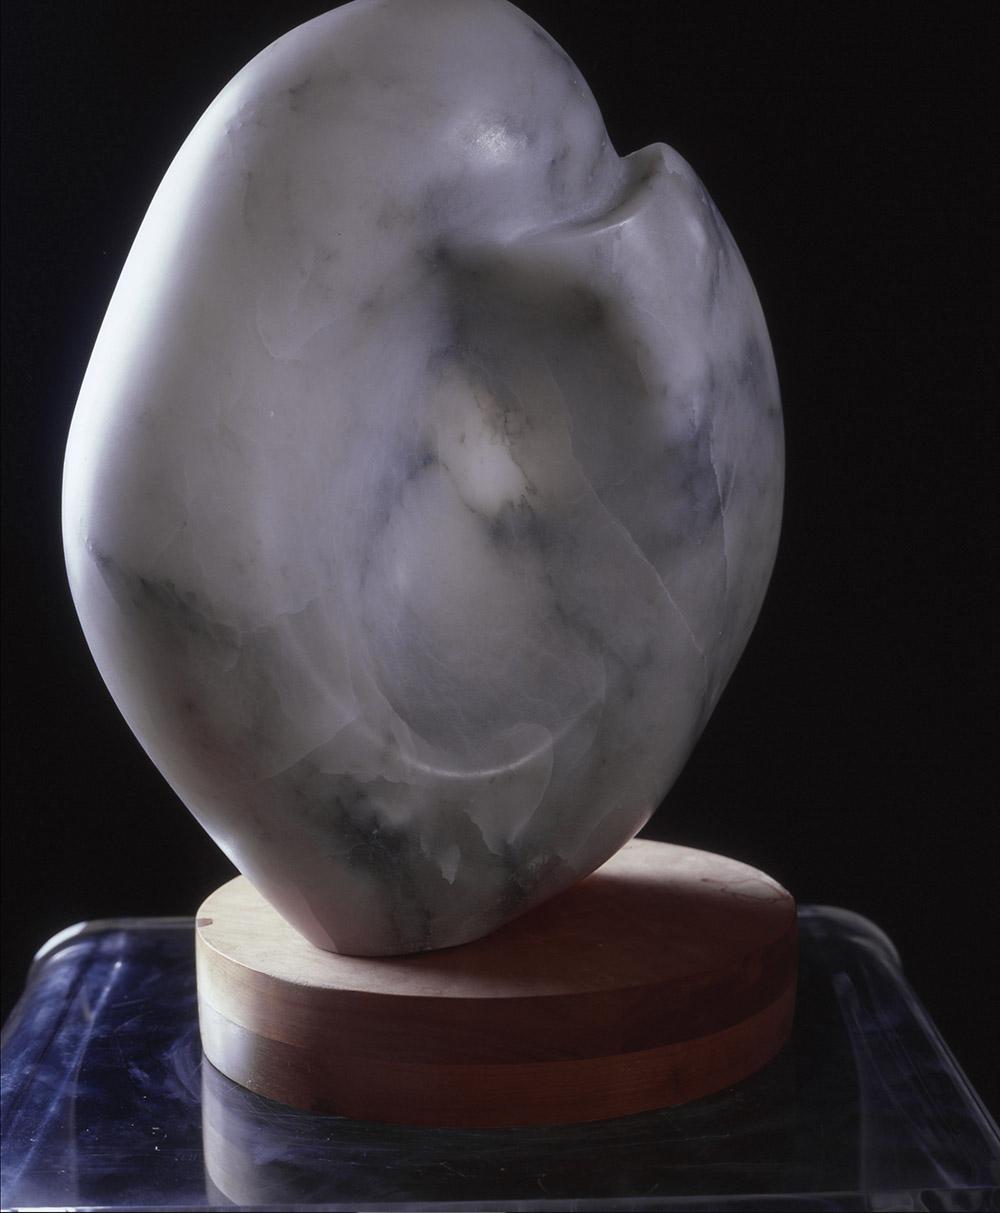 22.c-Ono-Love-1987.-Alabaster-33-x-25.4-x-15.2-cm-x.jpg